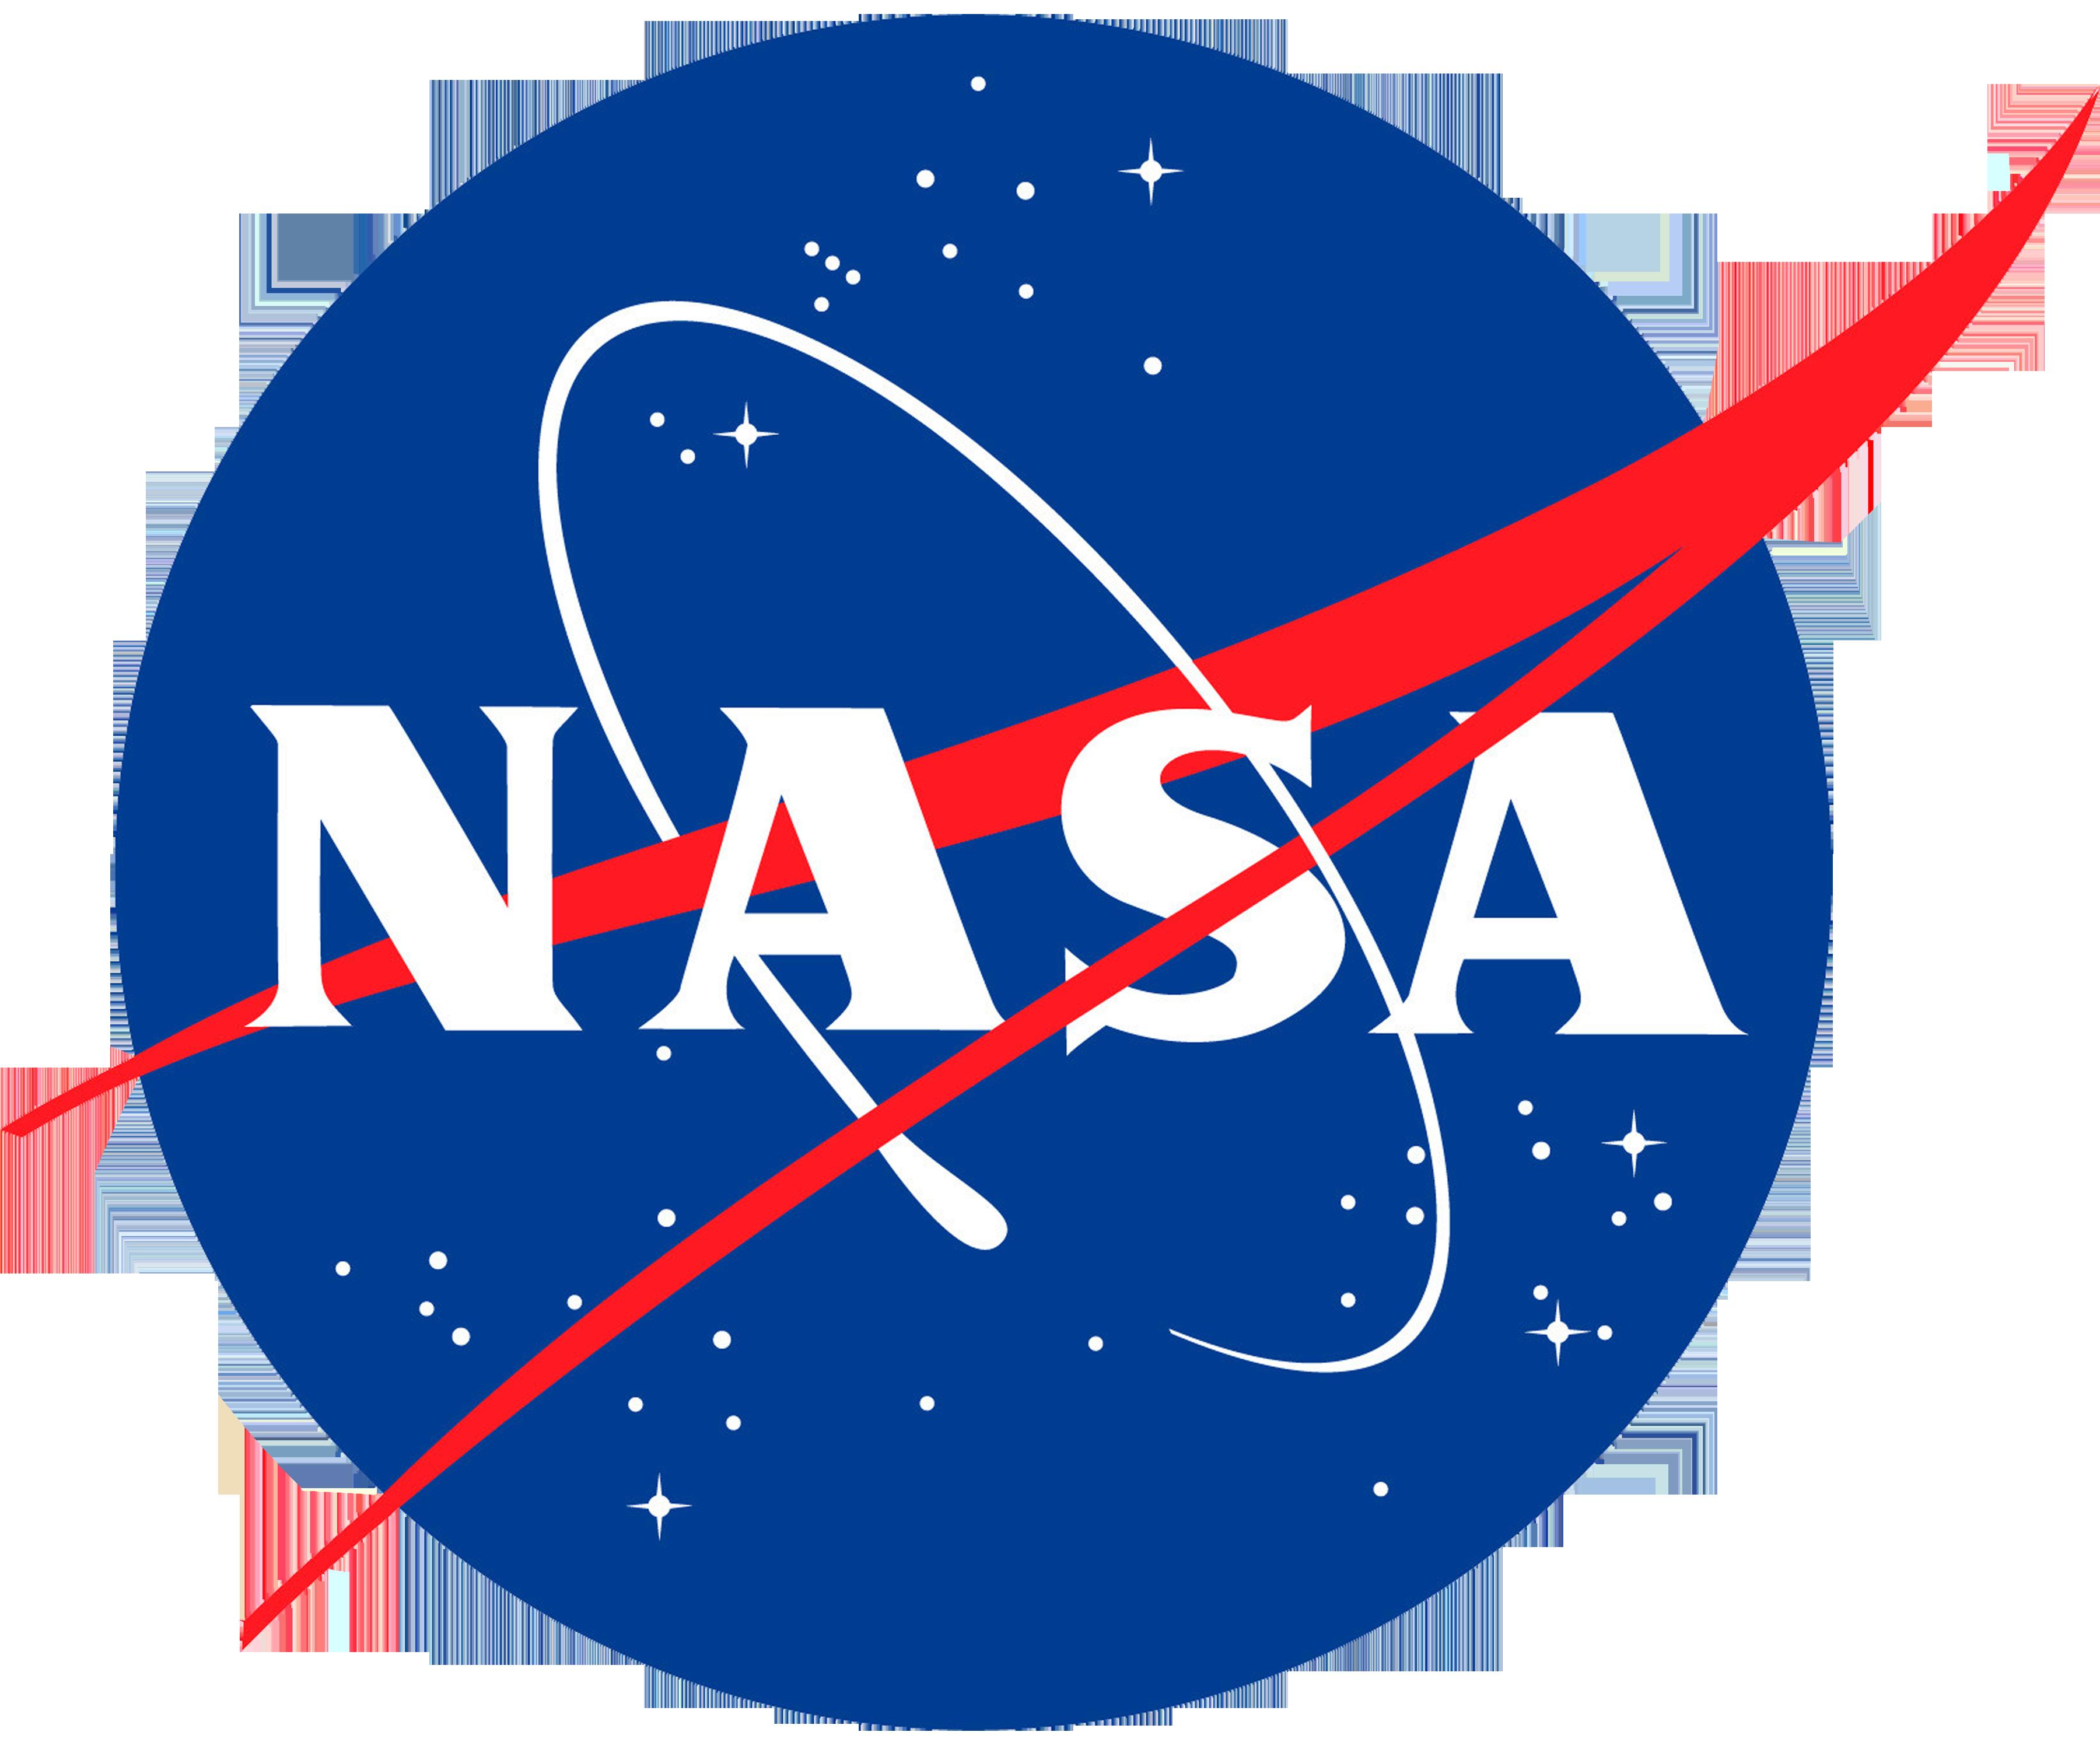 Nasa Logo Images HD Wallpaper 829922 2346 Wallpaper 3600x2993